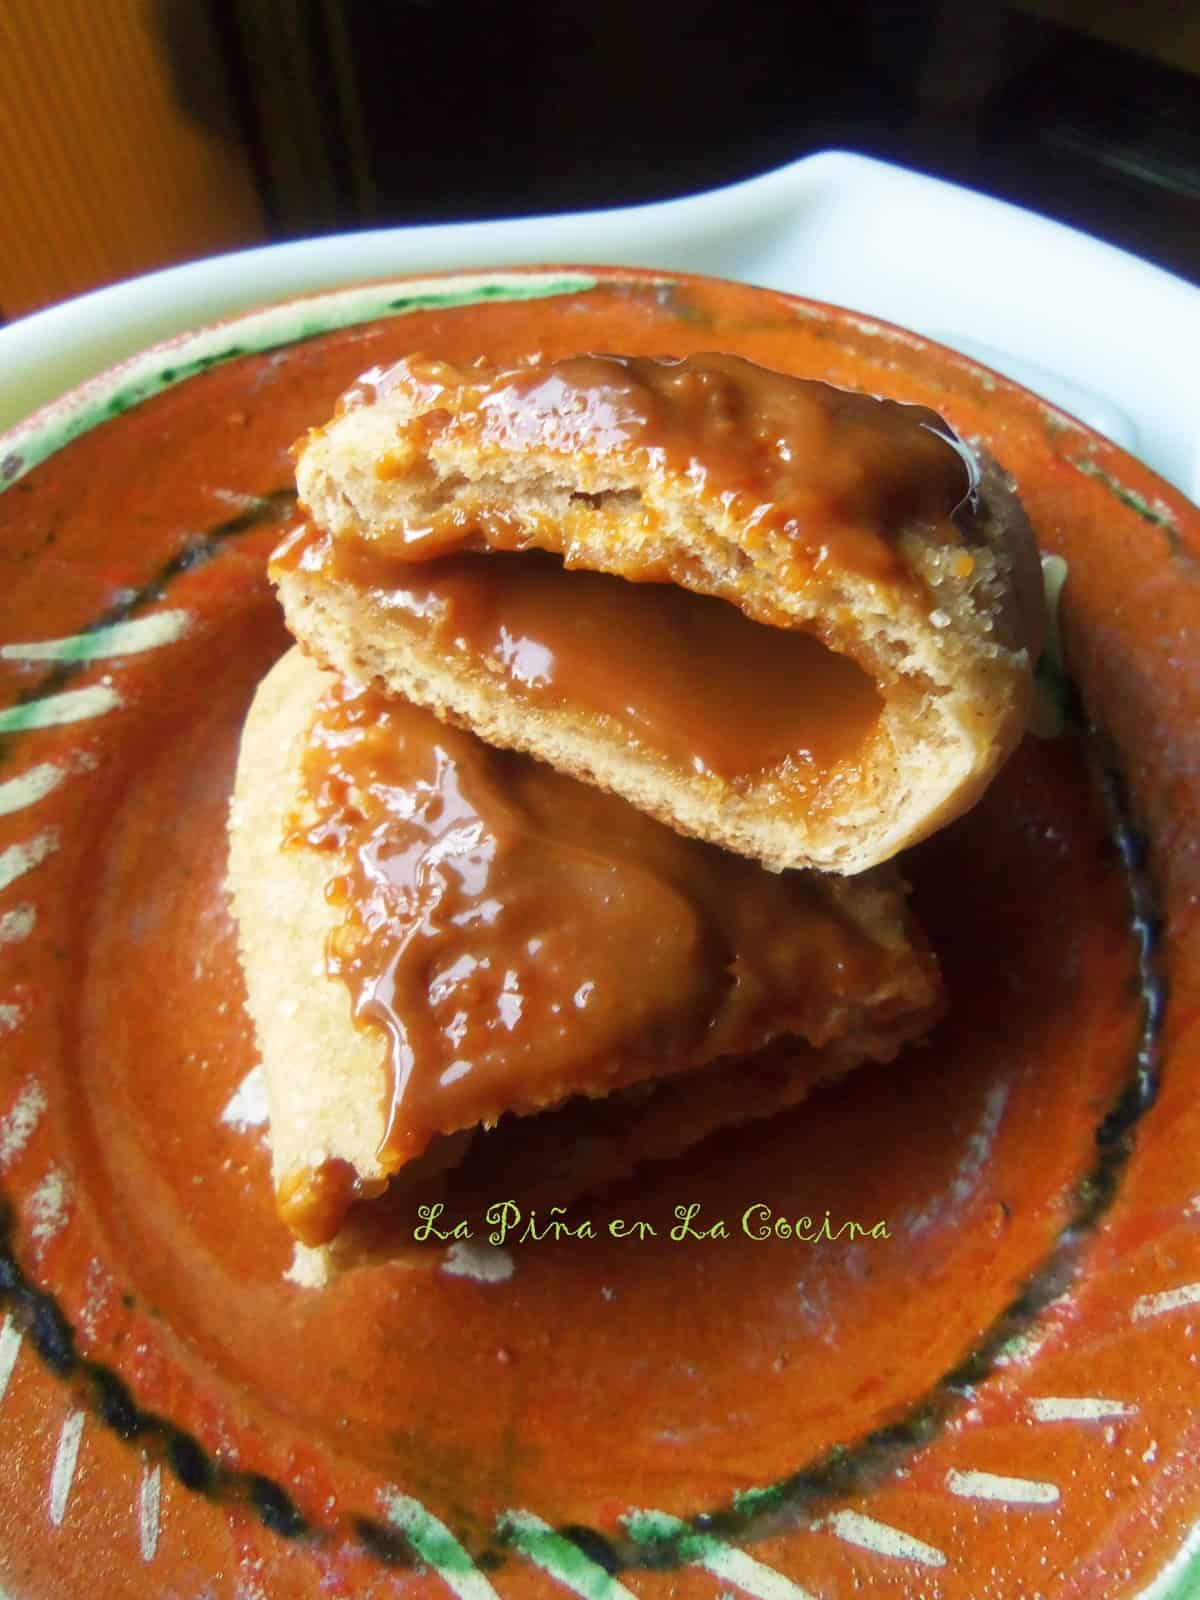 Testing empanada dough requires cajeta, dulce de leche. No fuss filling!